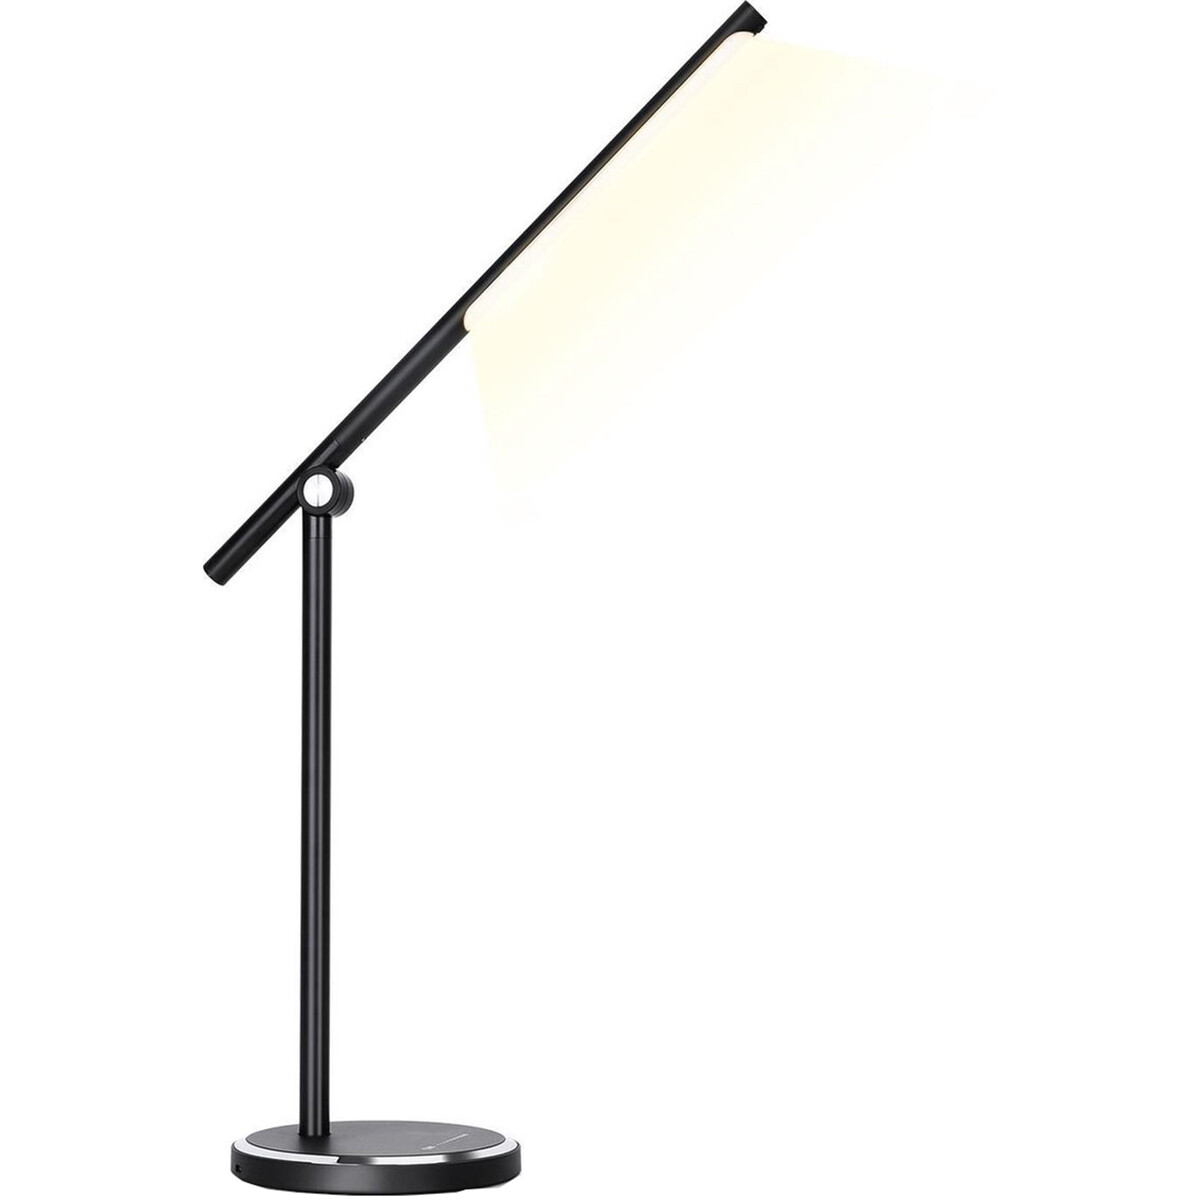 LED Tafellamp - Aigi Libo - 8W - USB Oplaadfunctie - Aanpasbare Kleur - Dimbaar - Rechthoek - Mat Zwart - Aluminium